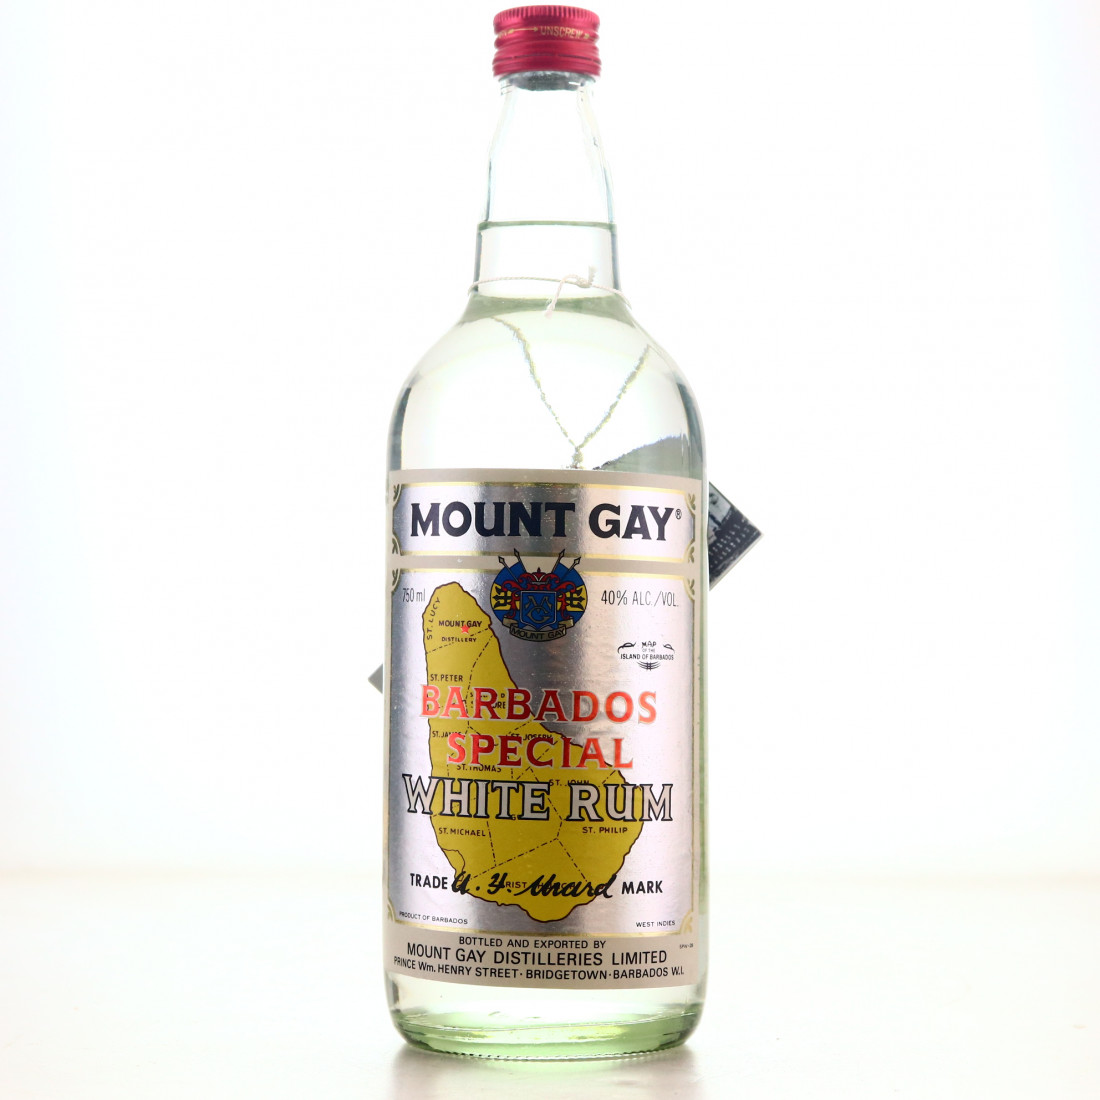 Mount Gay White Rum 1980s